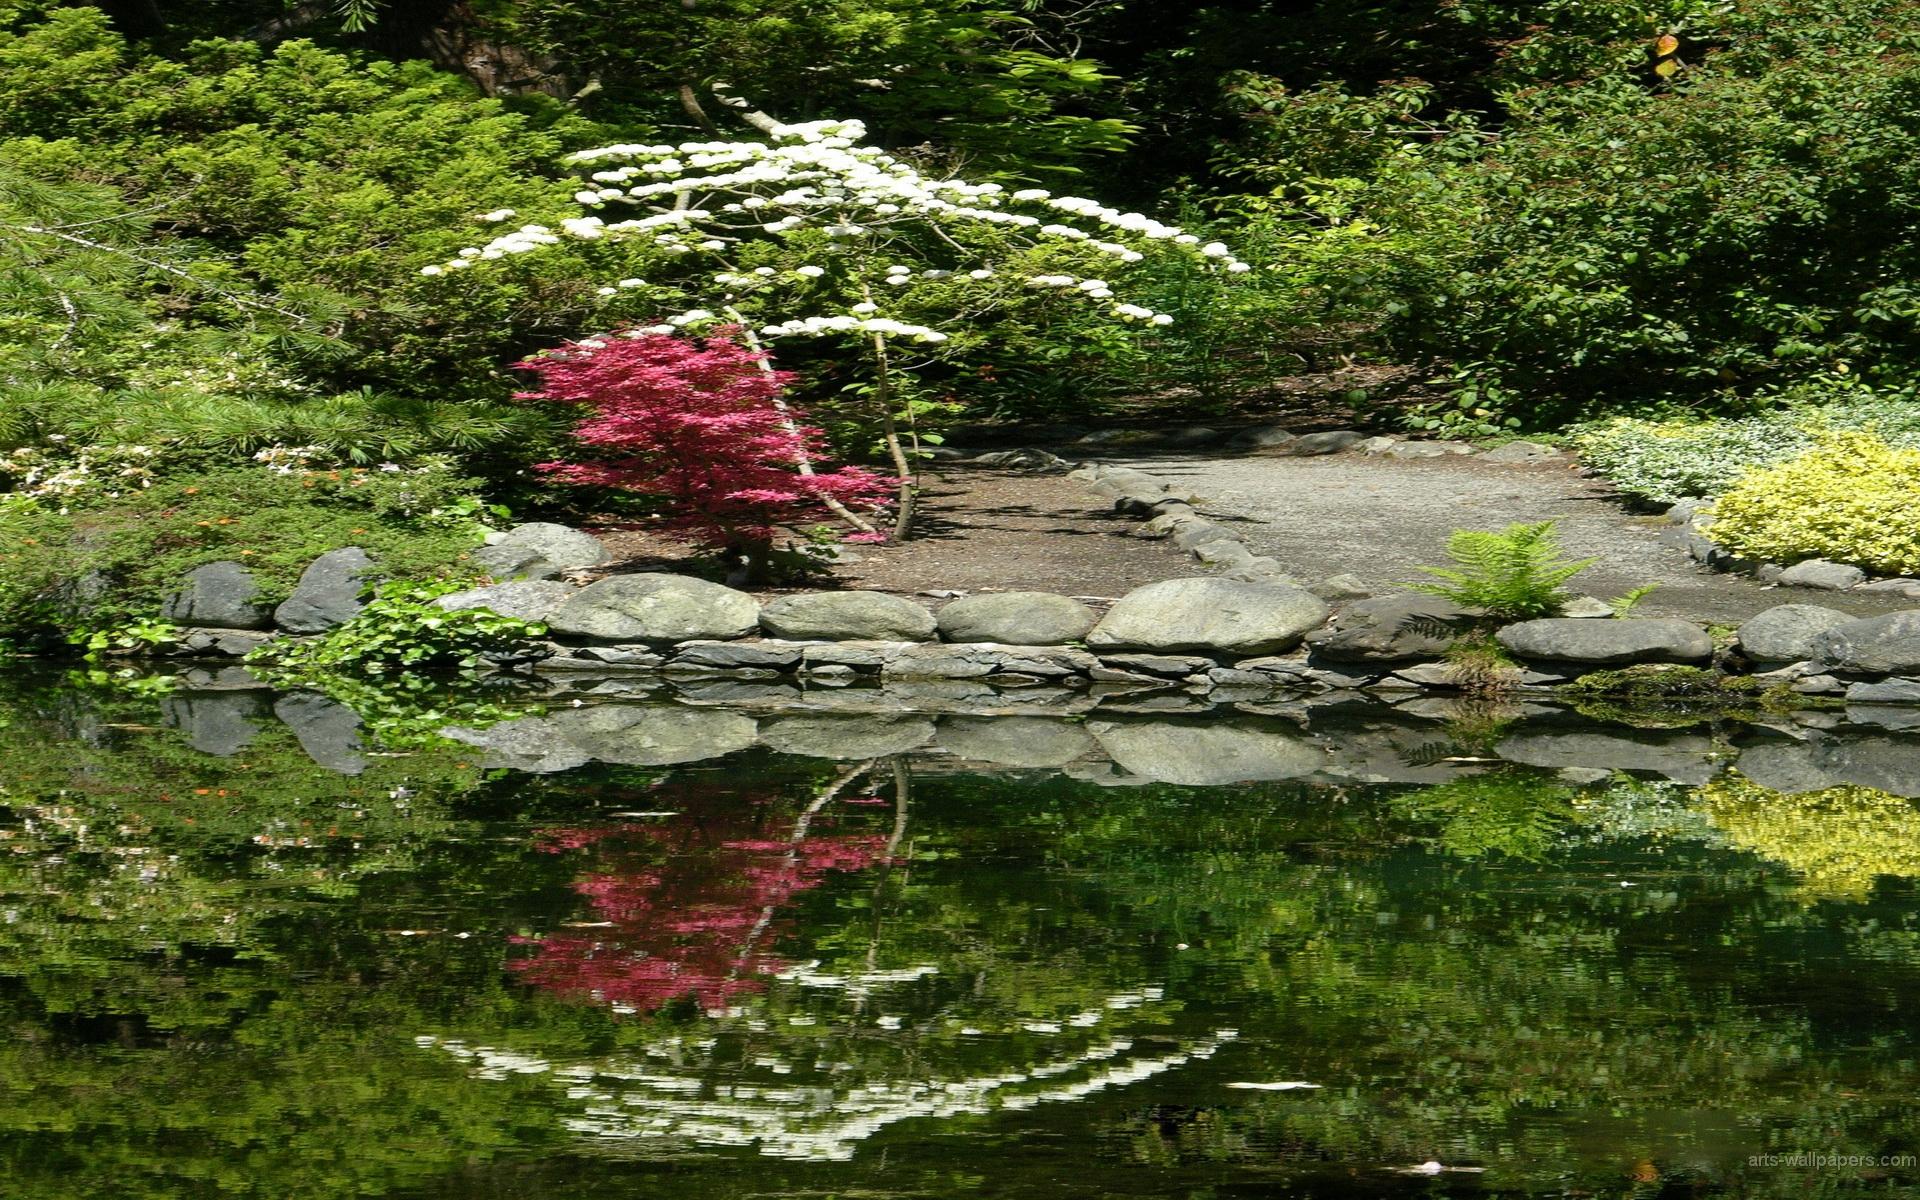 URL httpwallpaperswidecomjapanese garden 2 wallpapershtml 1920x1200